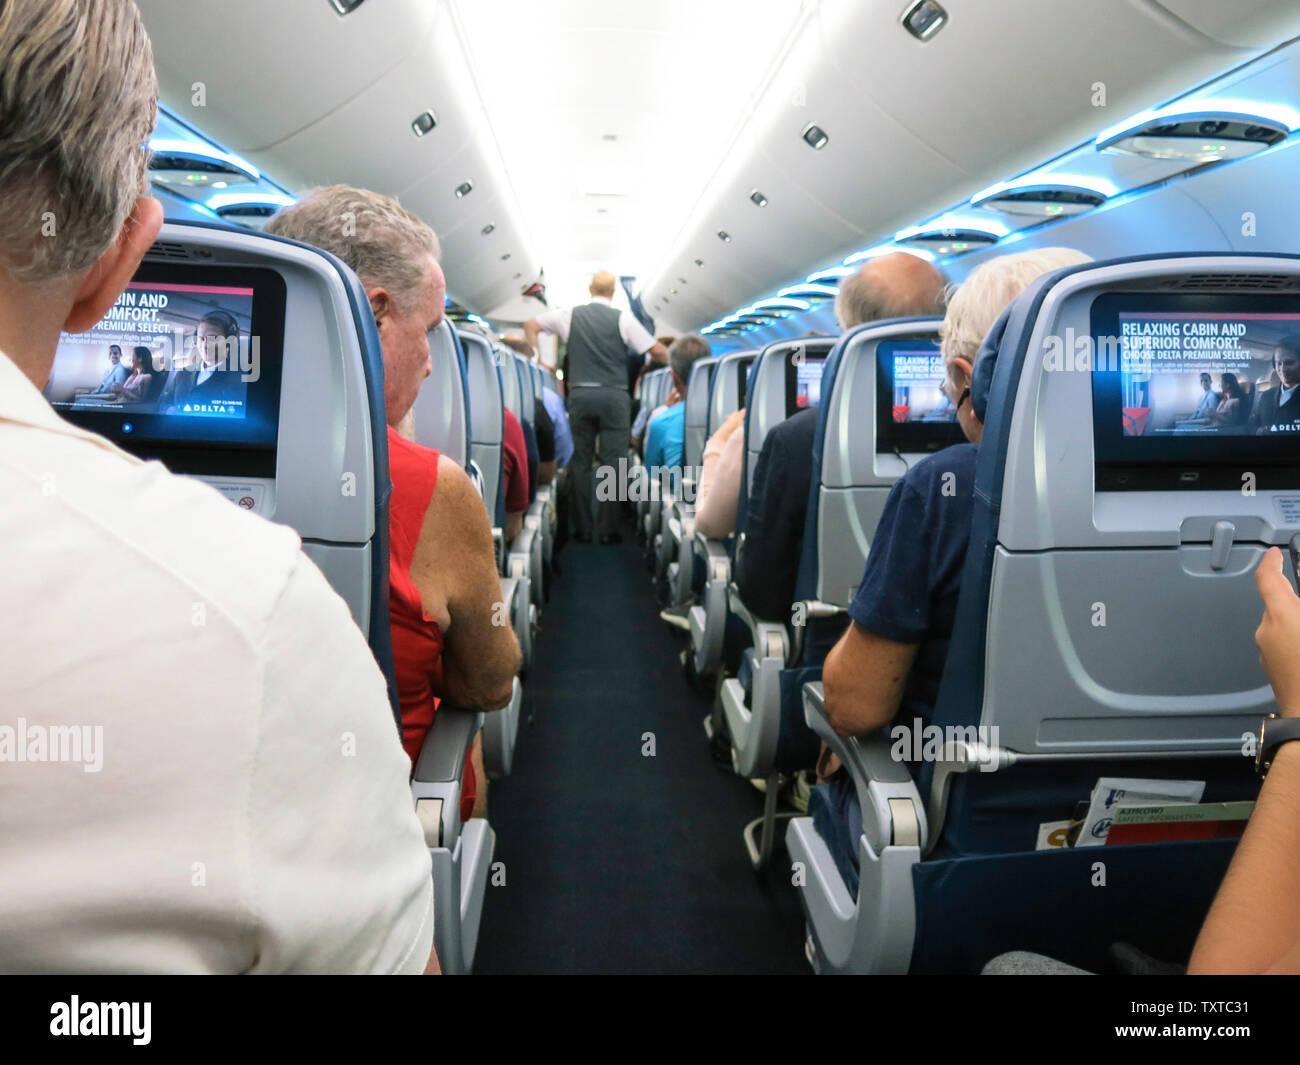 Passenger Cabin on a Delta Airline Flight, USA Stock Photo